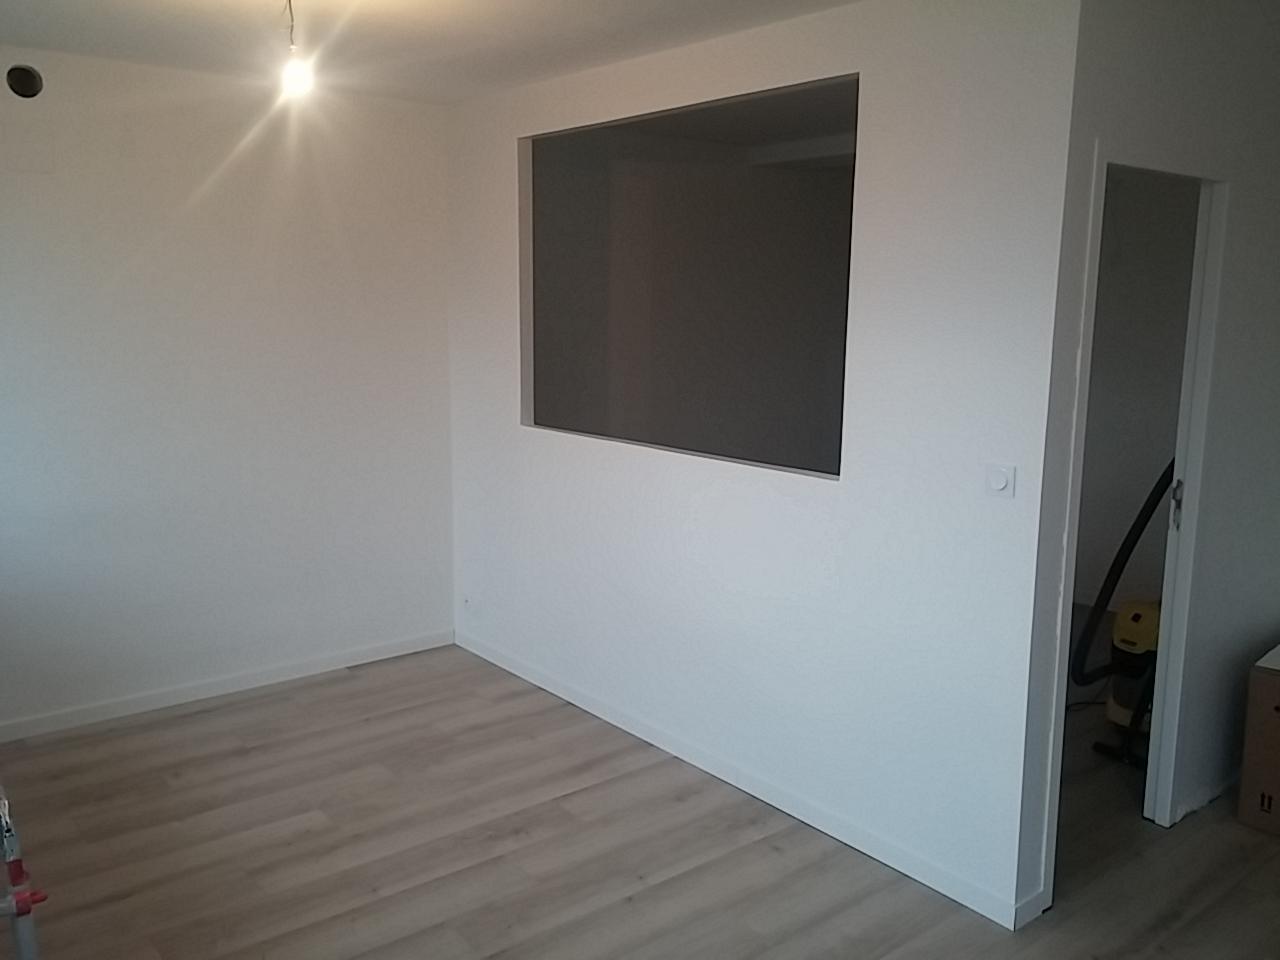 abattre une cloison placo ravishingly integrer brique. Black Bedroom Furniture Sets. Home Design Ideas